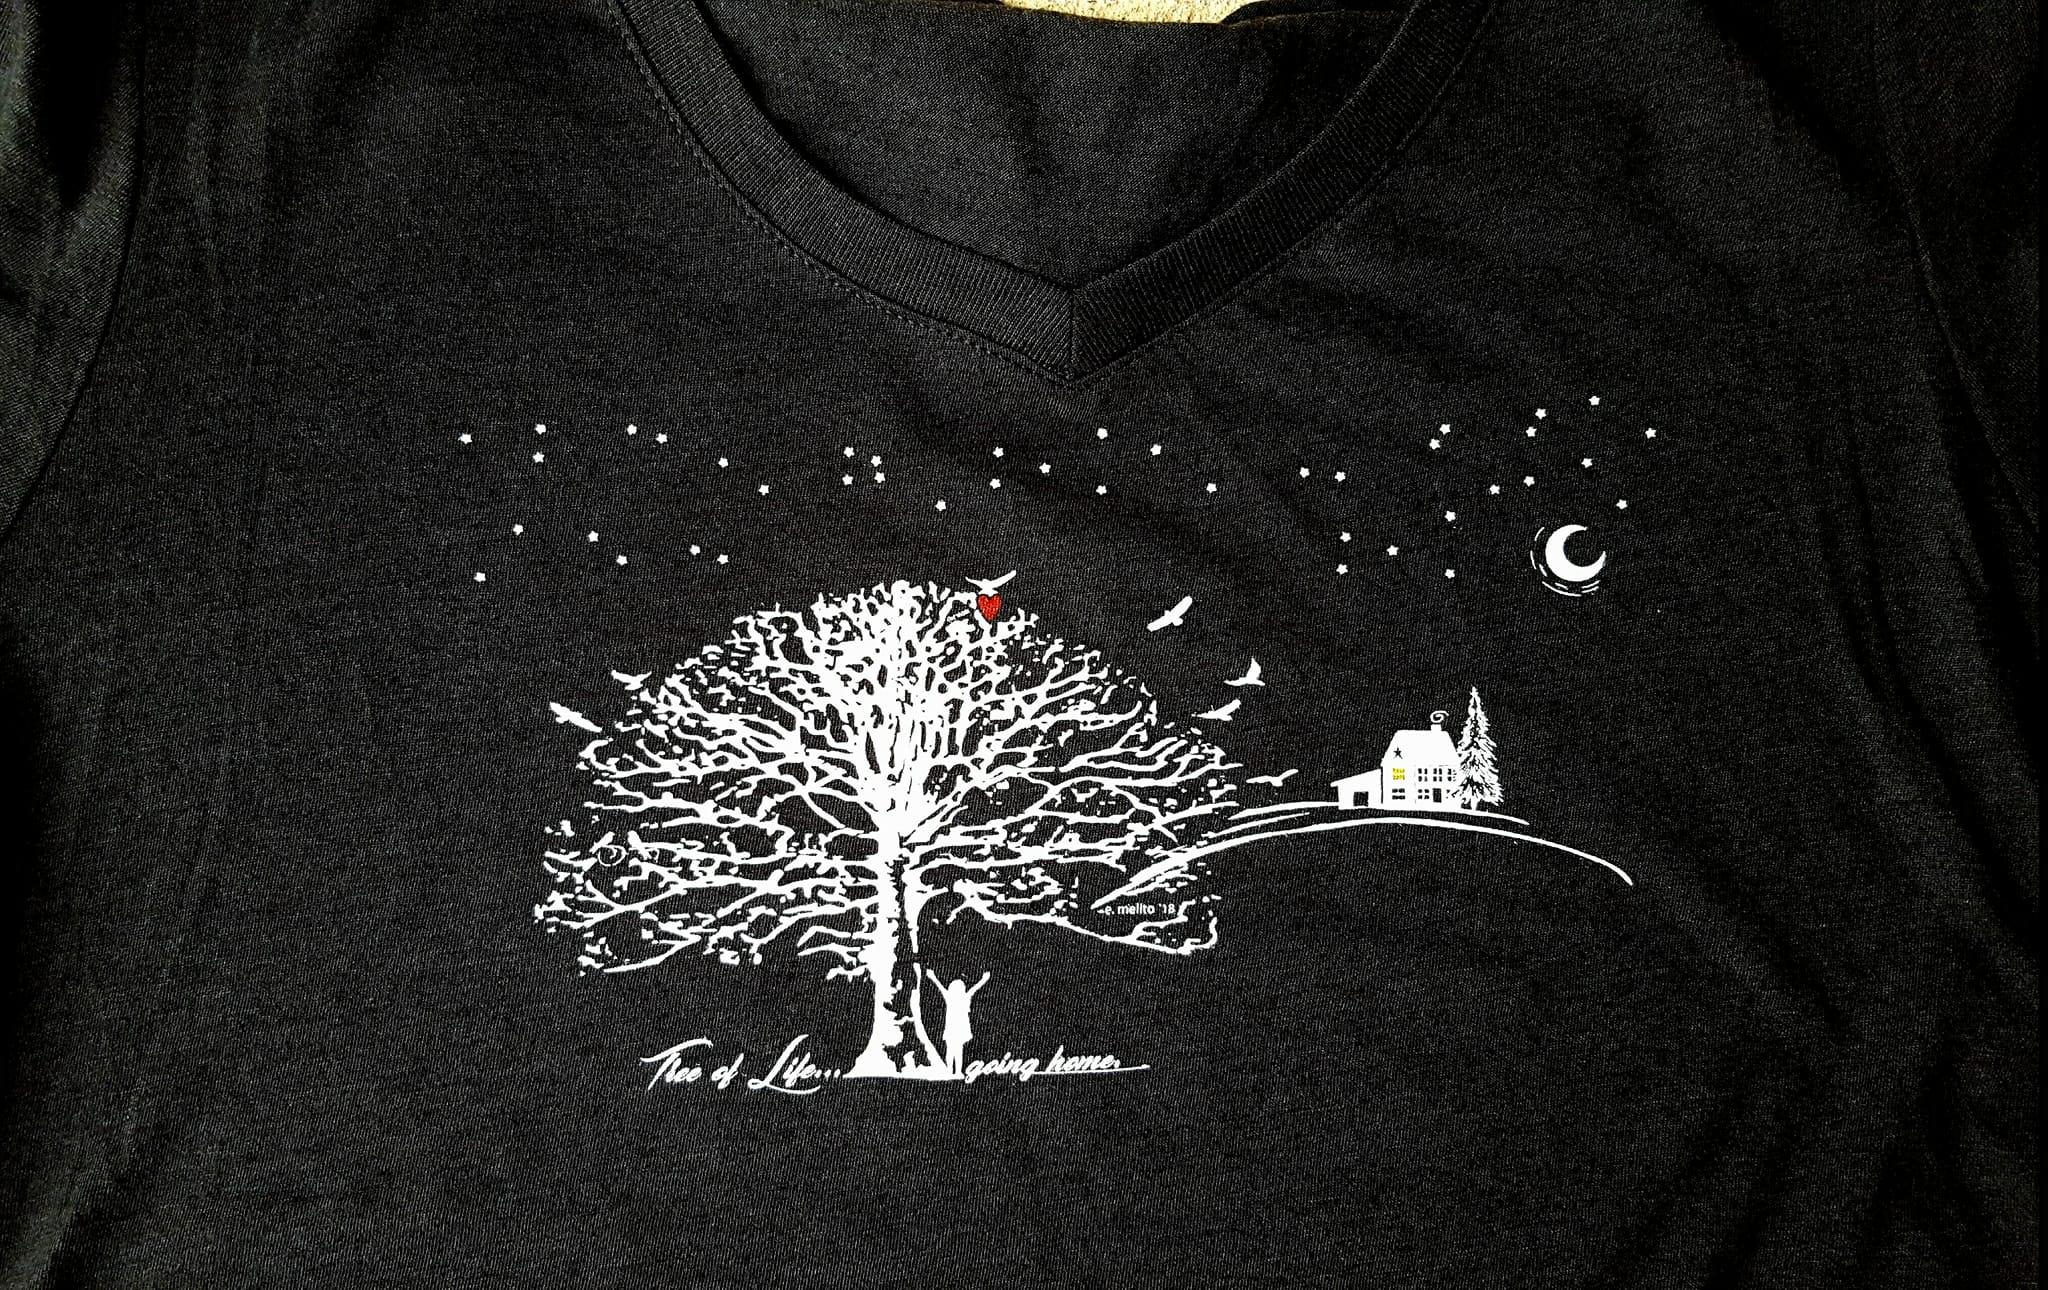 46fac7db8 Vintage Primo Beer T Shirt - DREAMWORKS